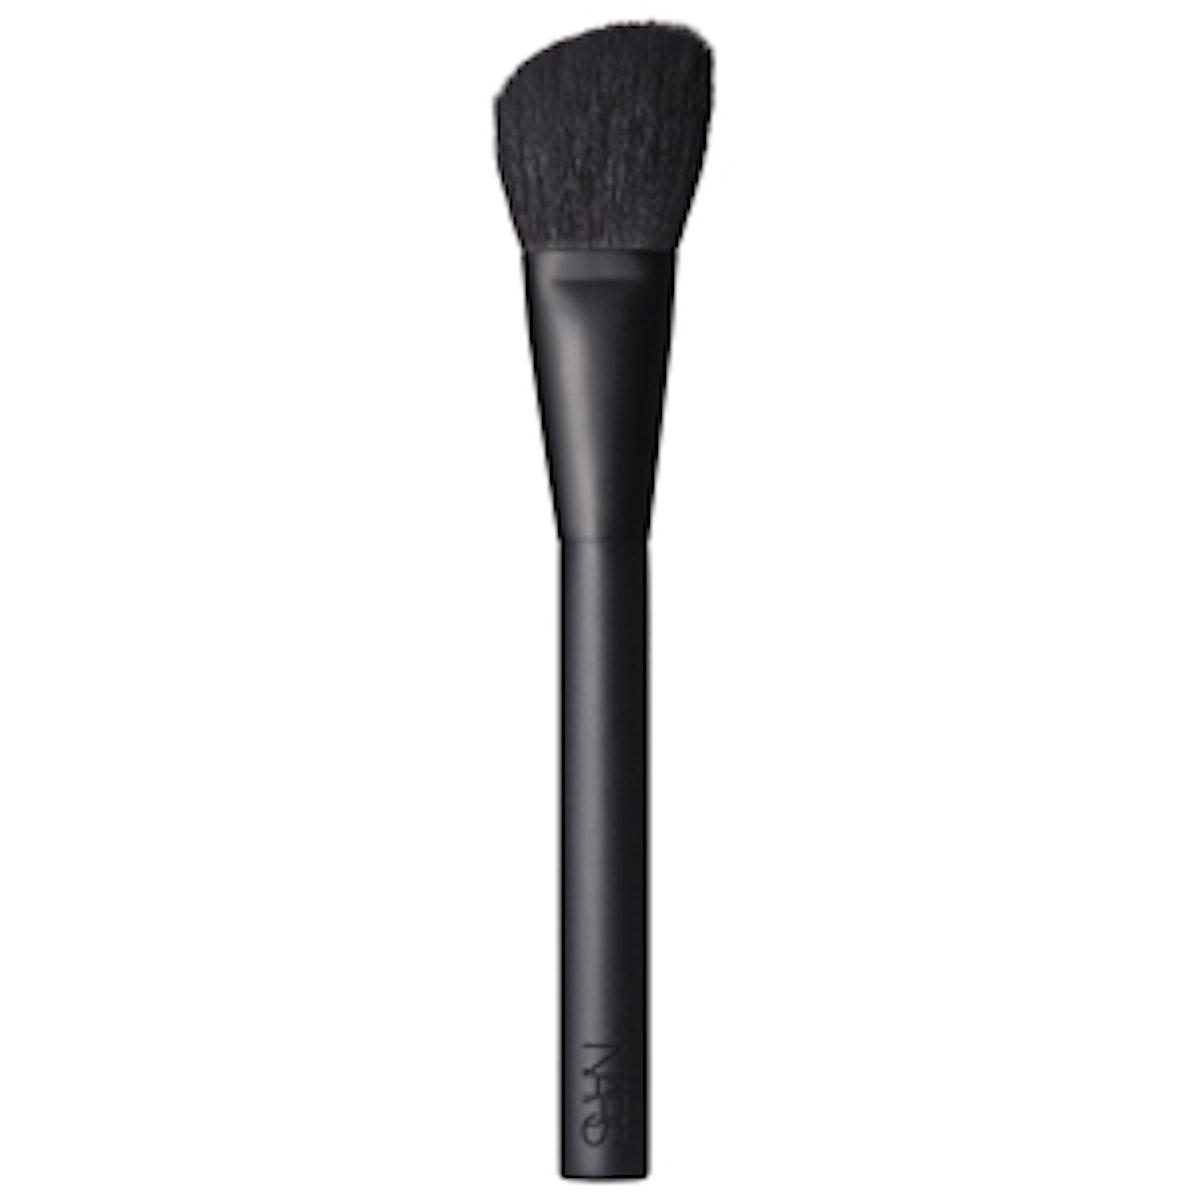 NARS #21 Contour Brush